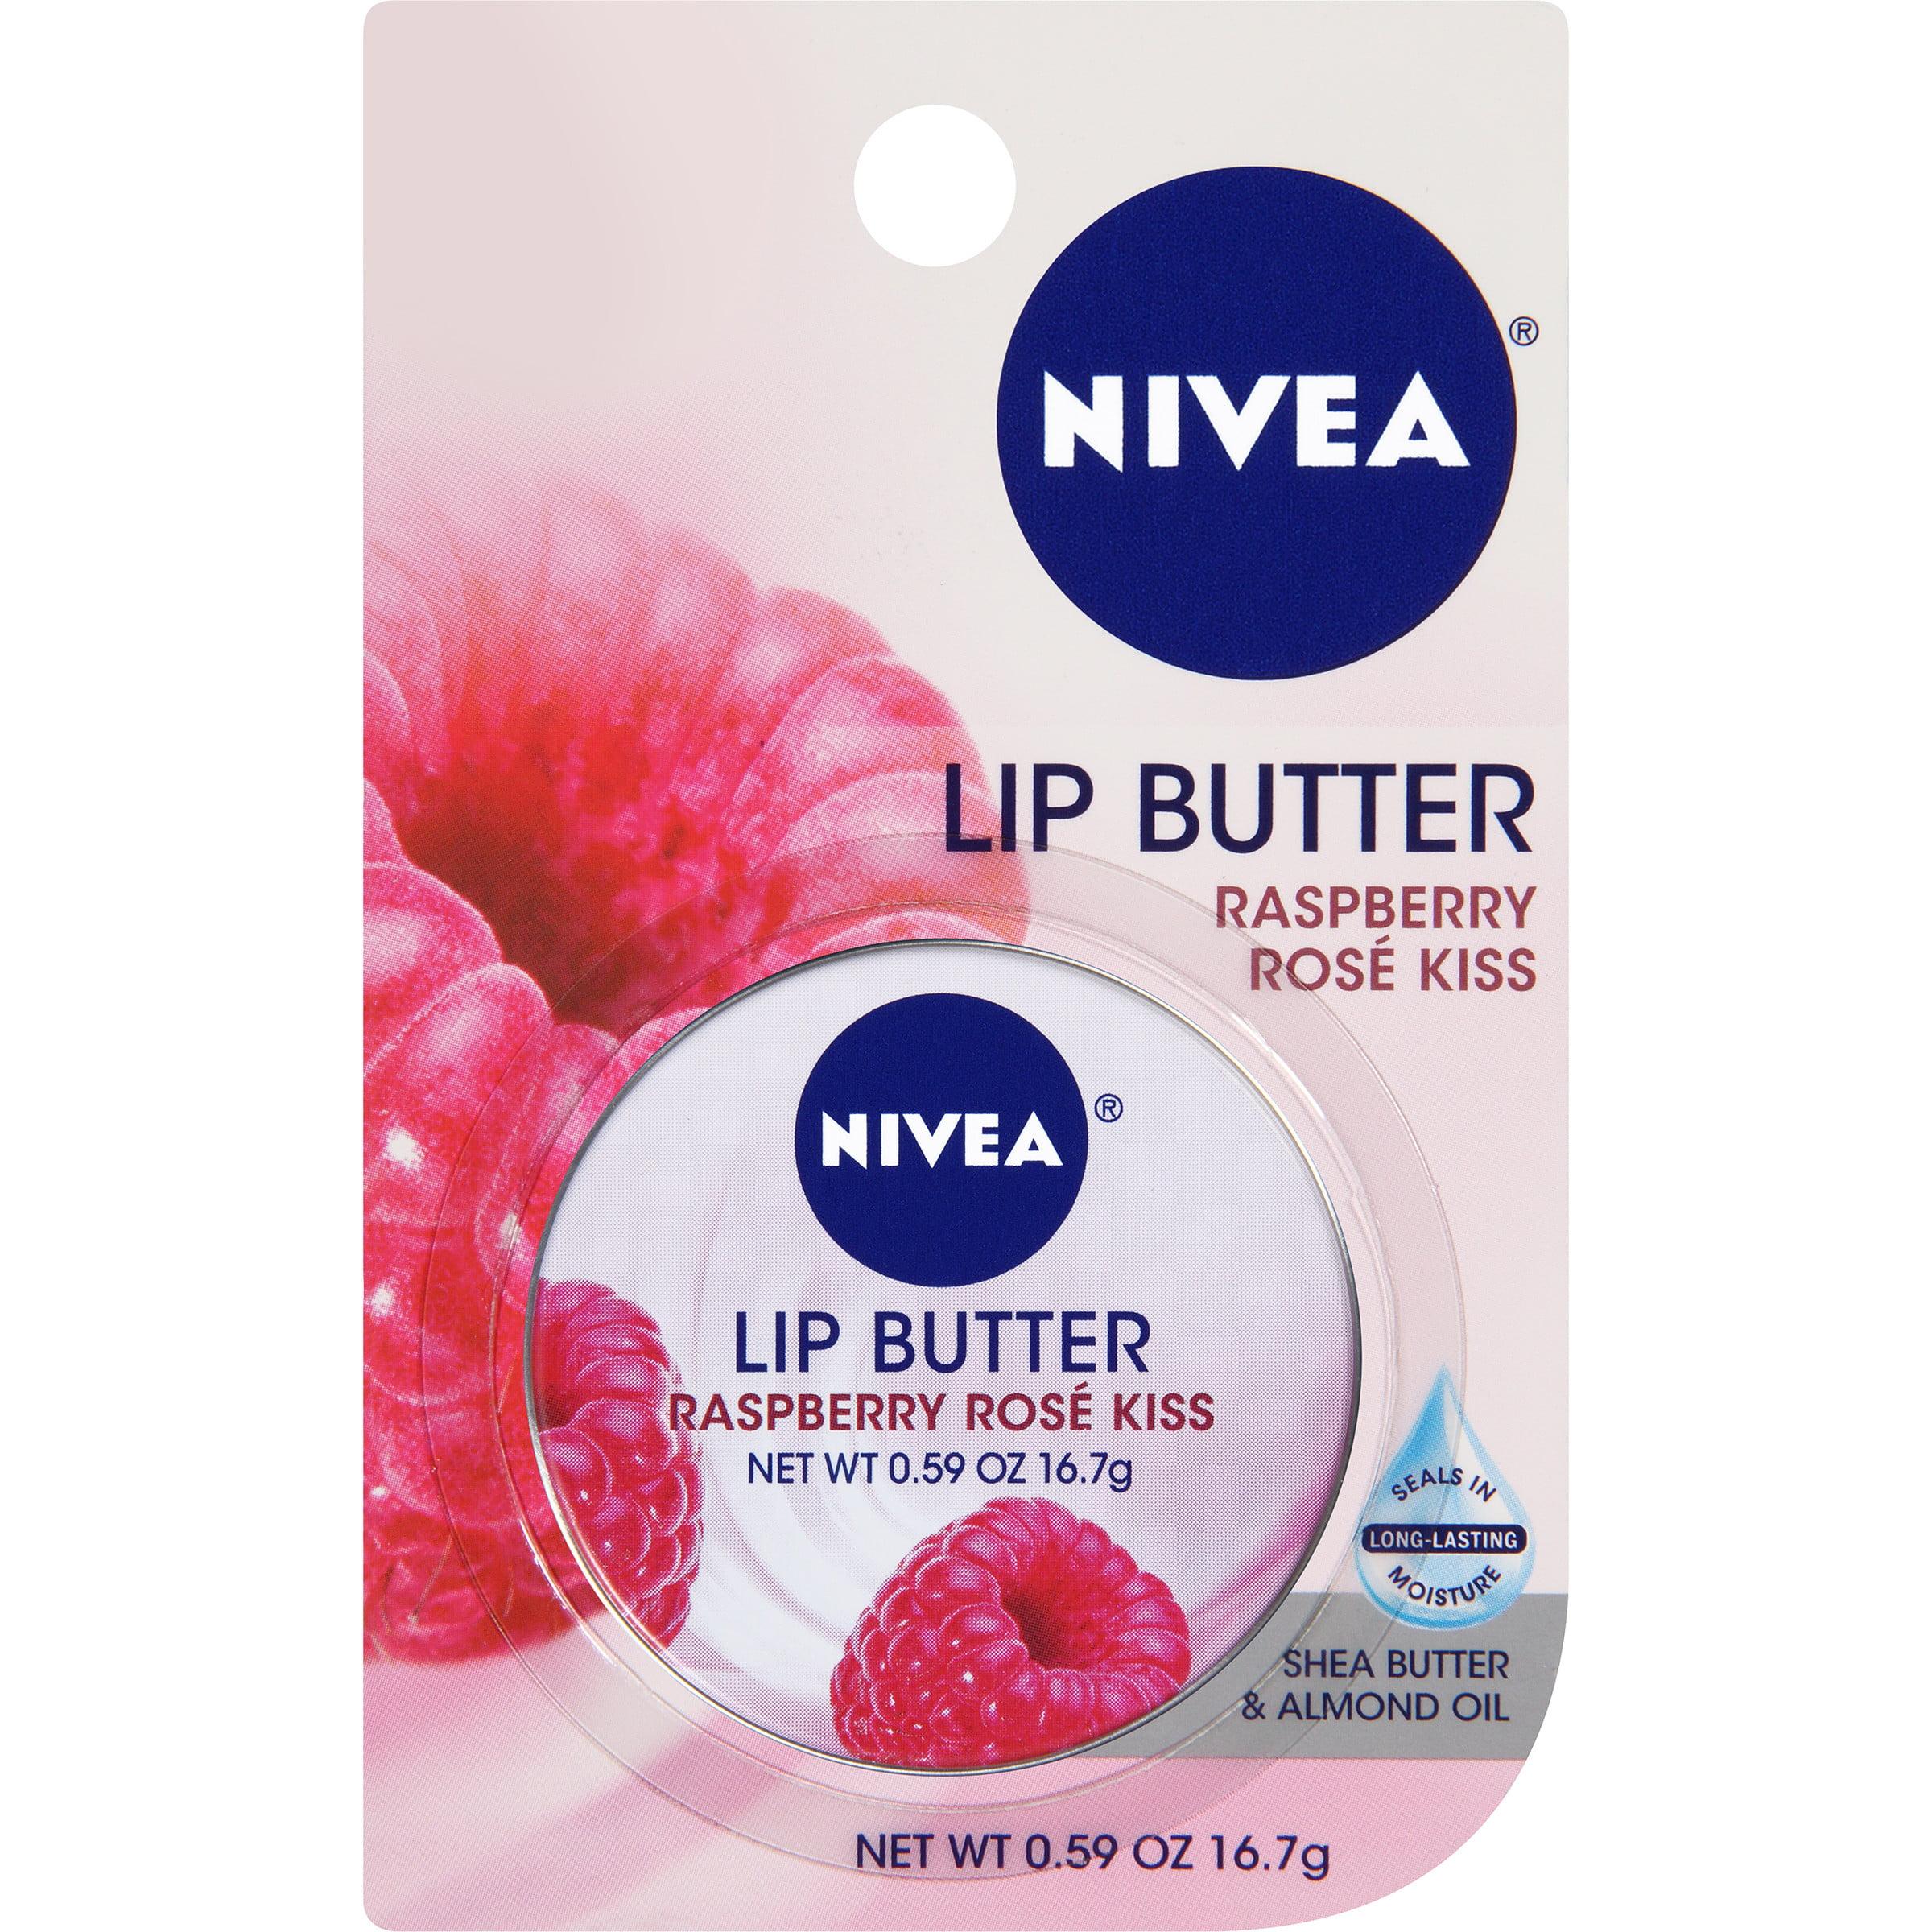 NIVEA Raspberry Rose Lip Butter 0.59 oz. Carded Tin